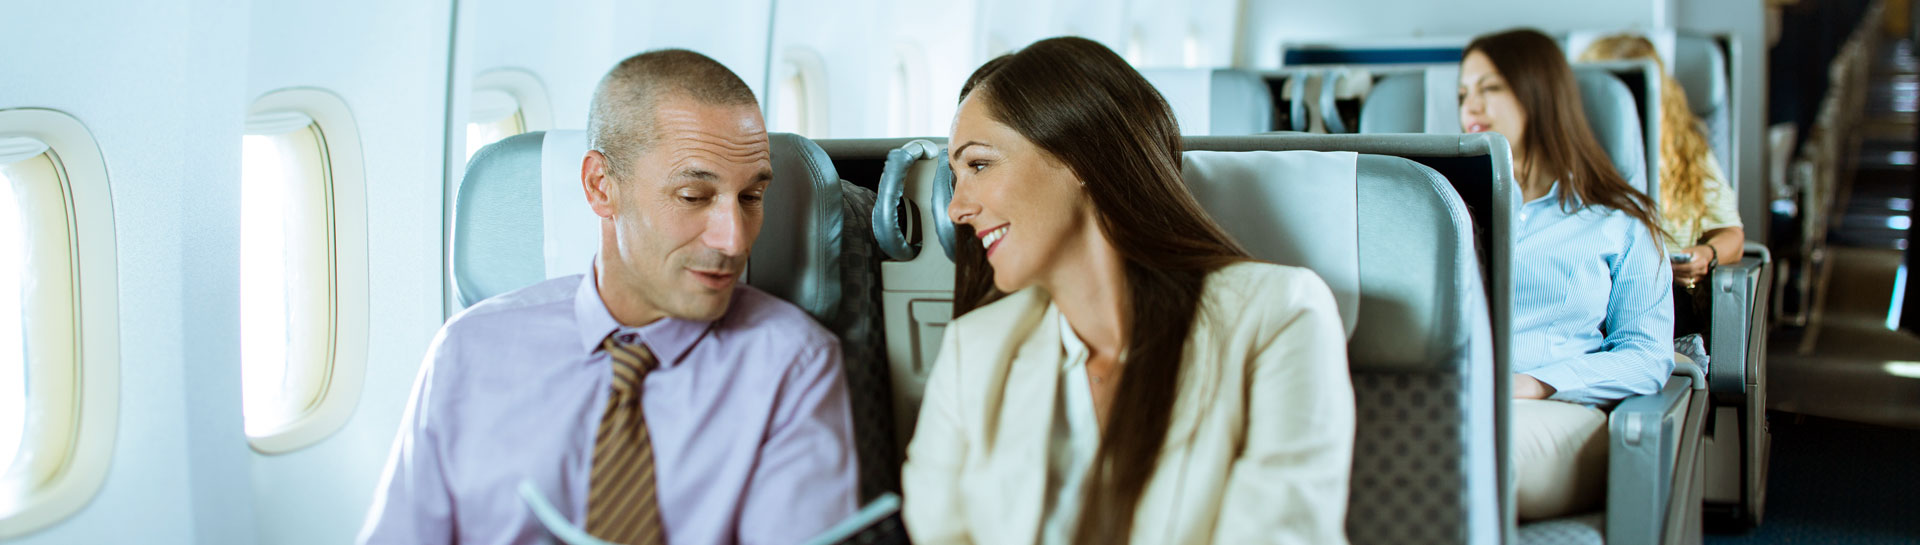 2013 Business C Al | fares cheap flights deals, ynetnews